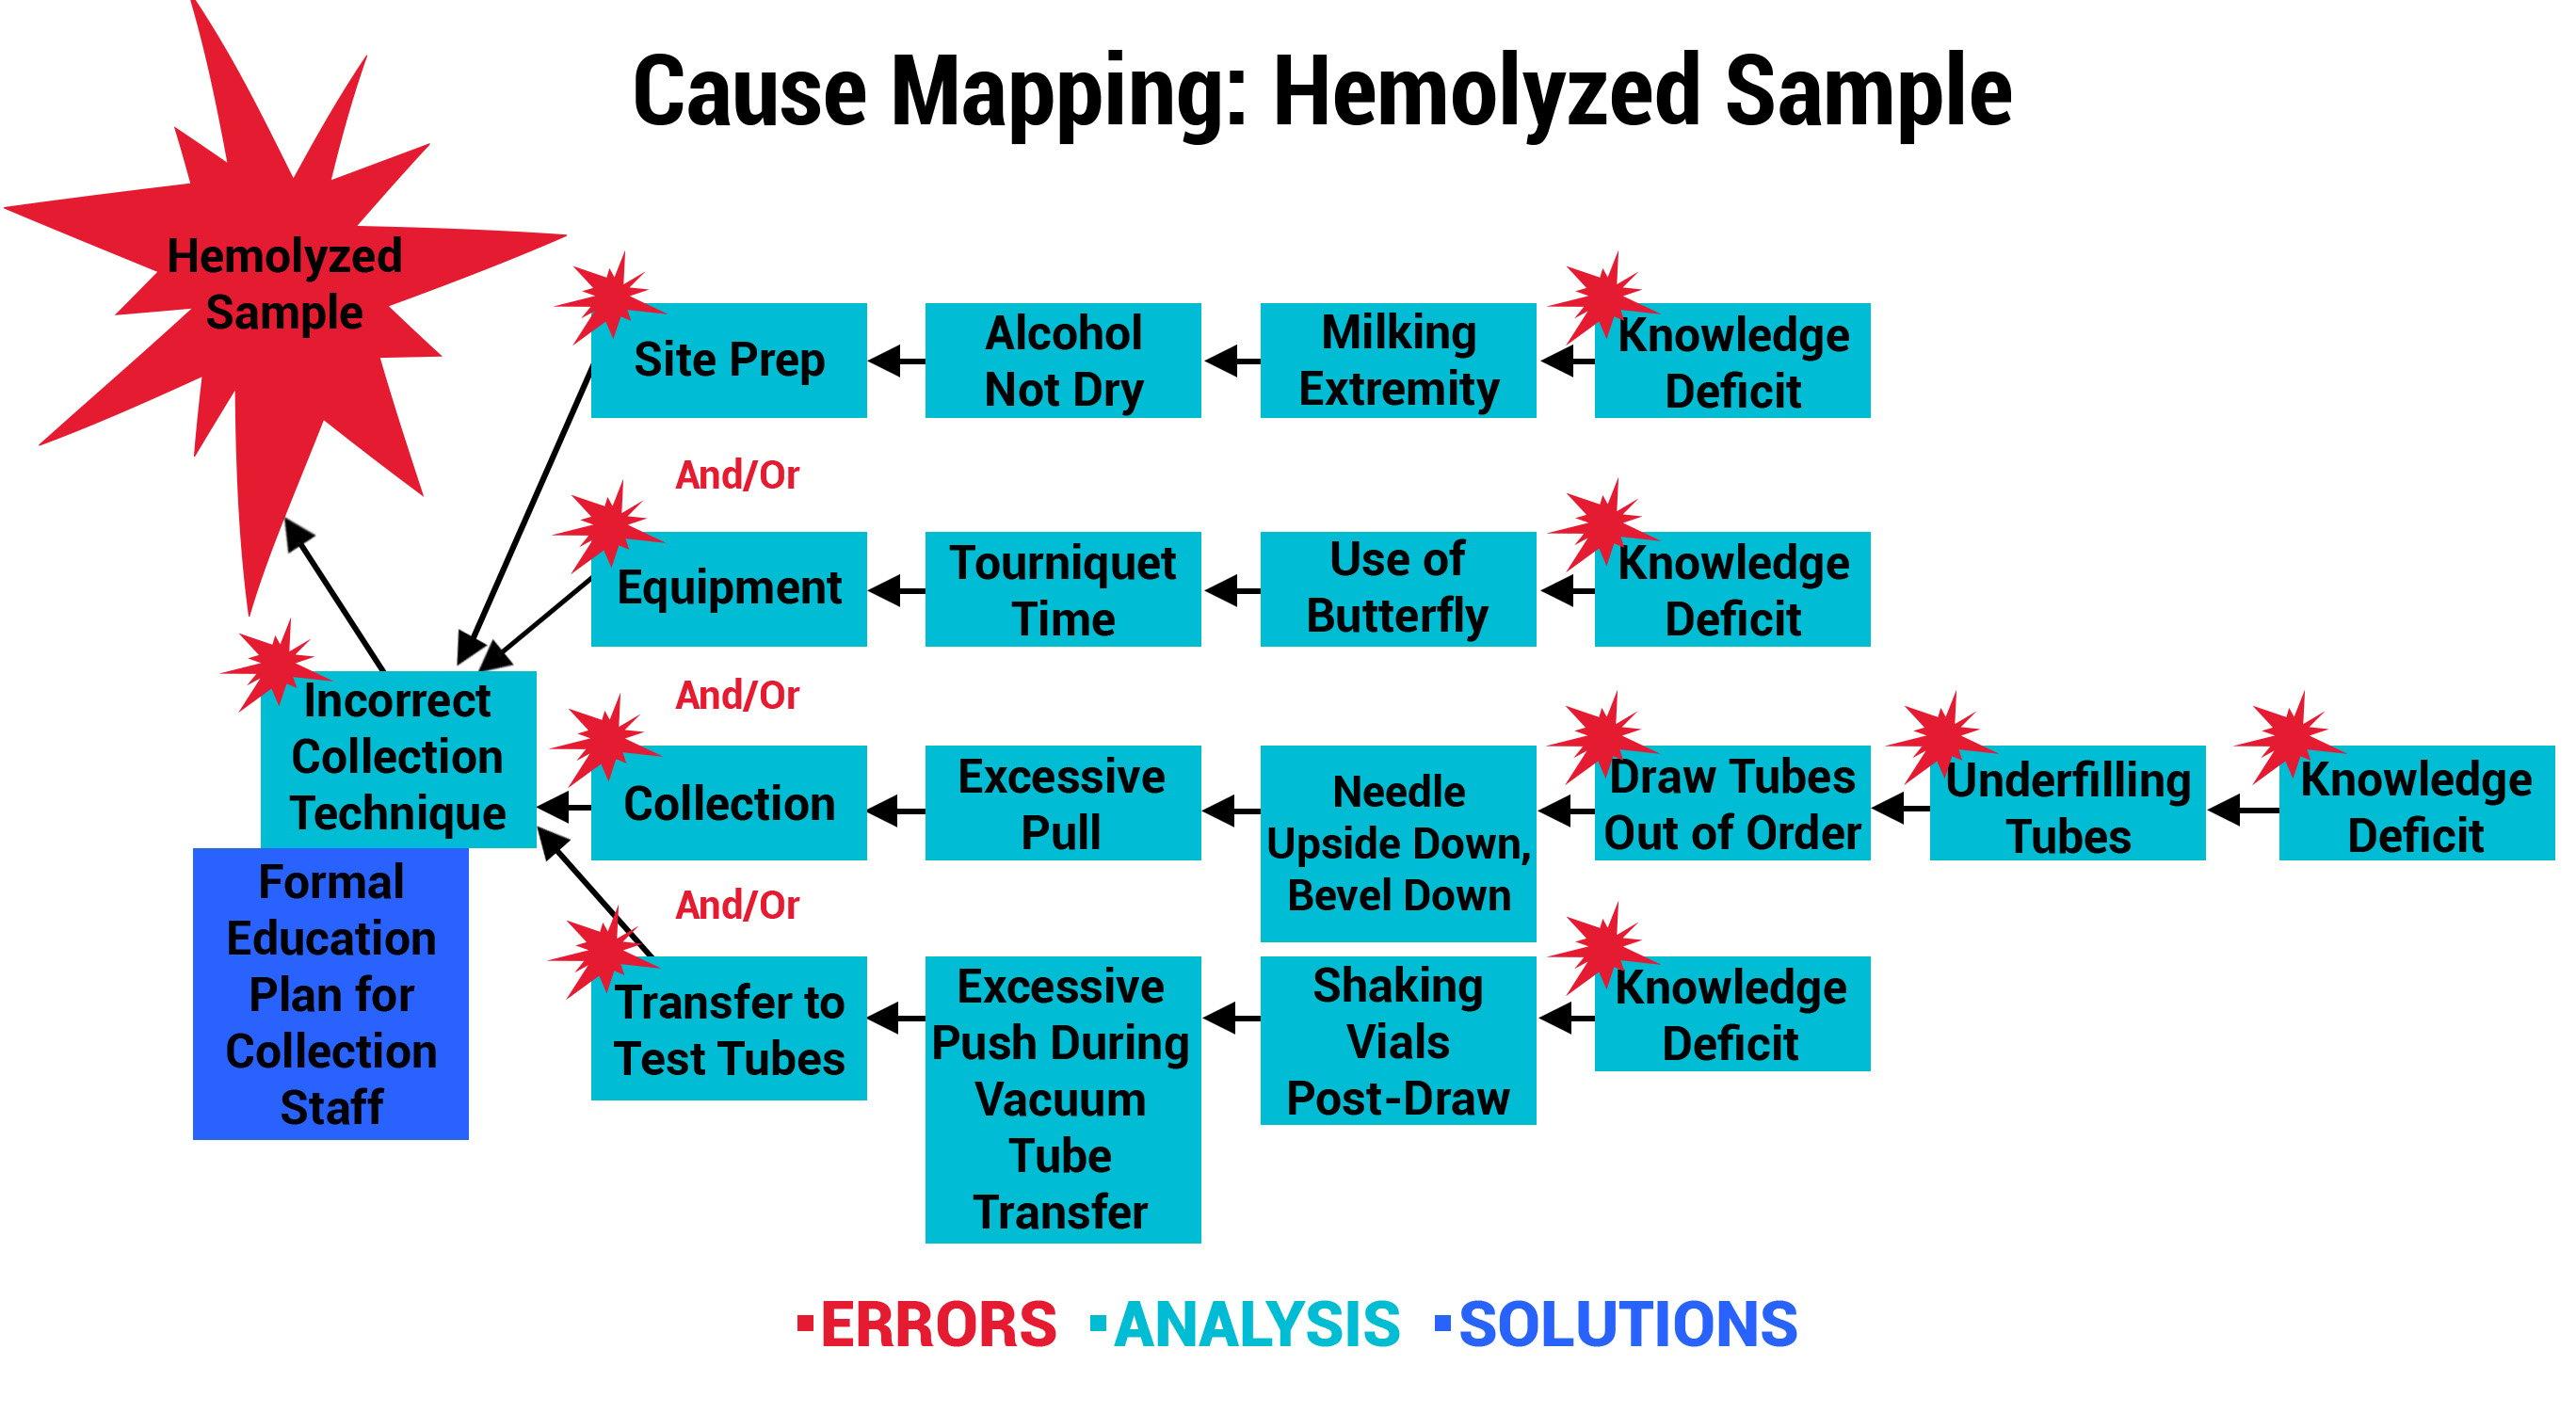 cause map hemolyzed sample_edited 2-20-smaller